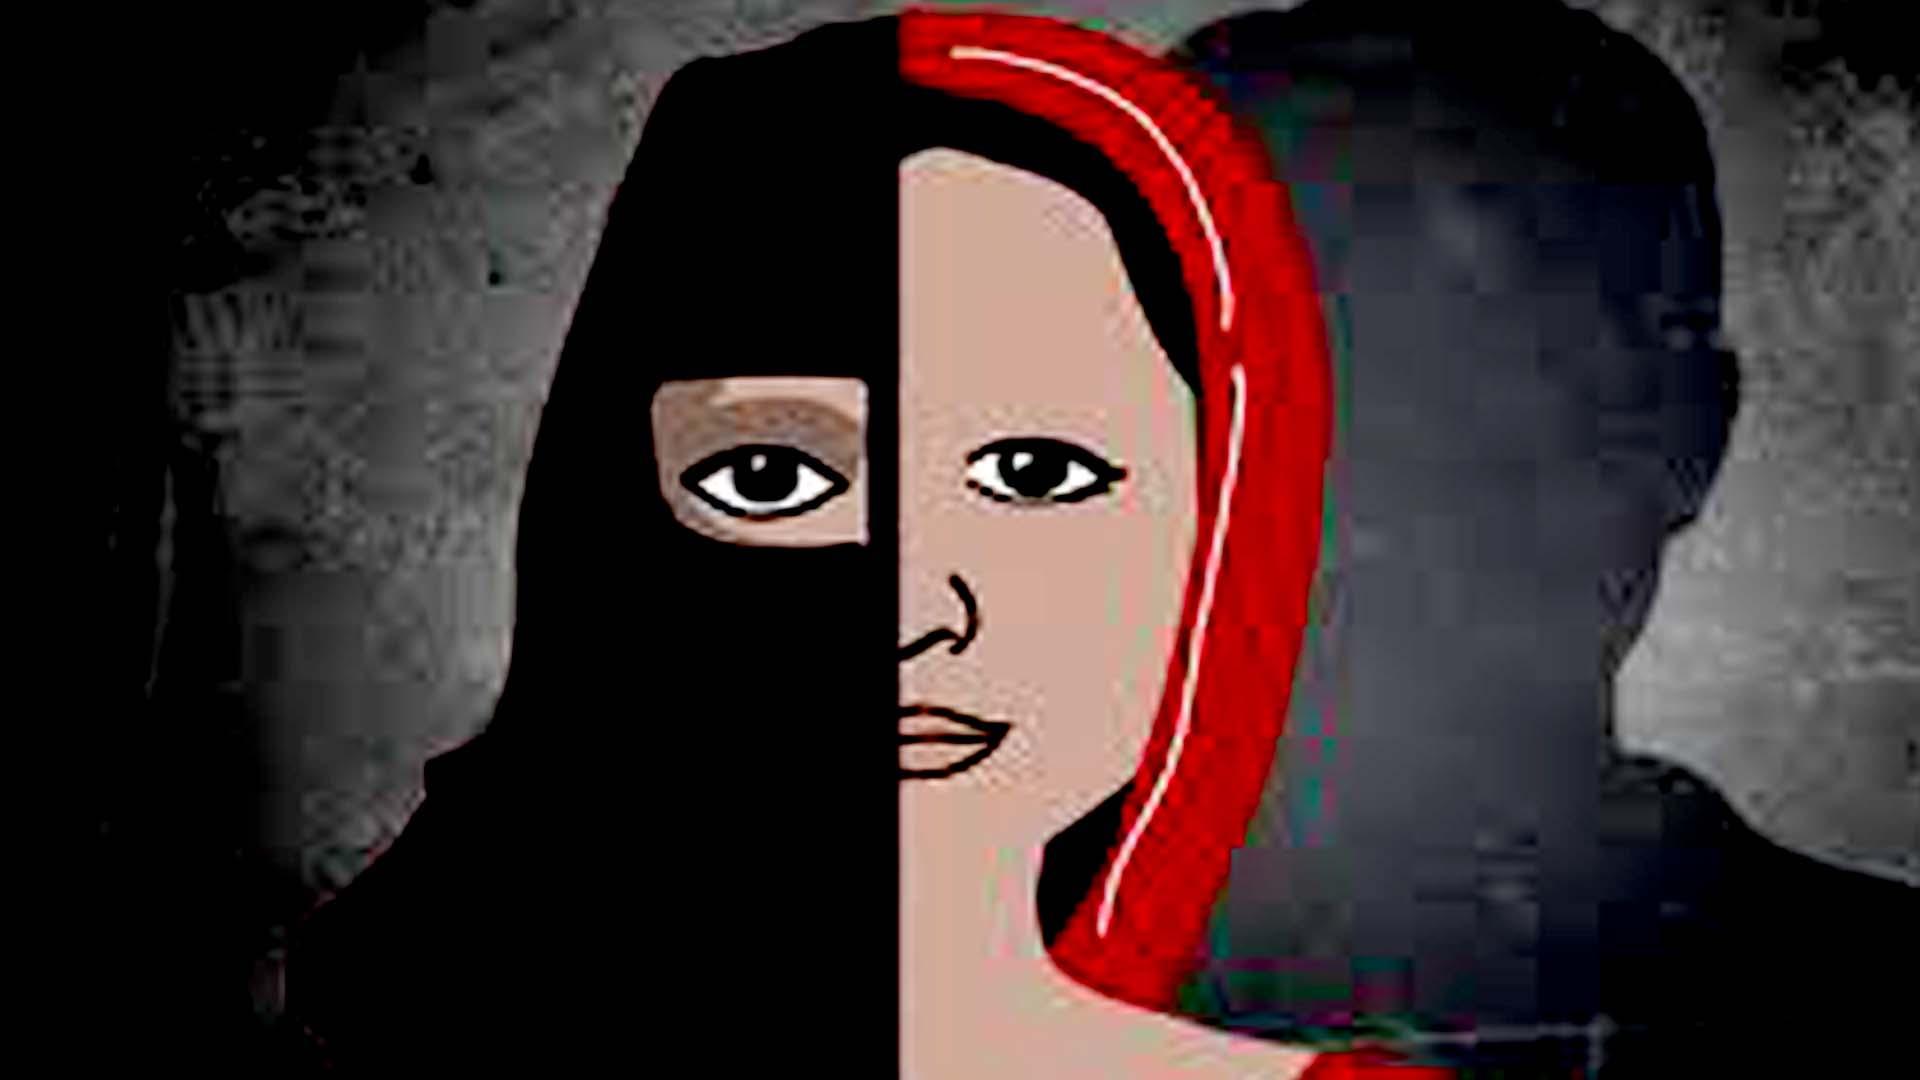 After Uttar Pradesh and Haryana, Madhya Pradesh is All Set to Control Love Jihad